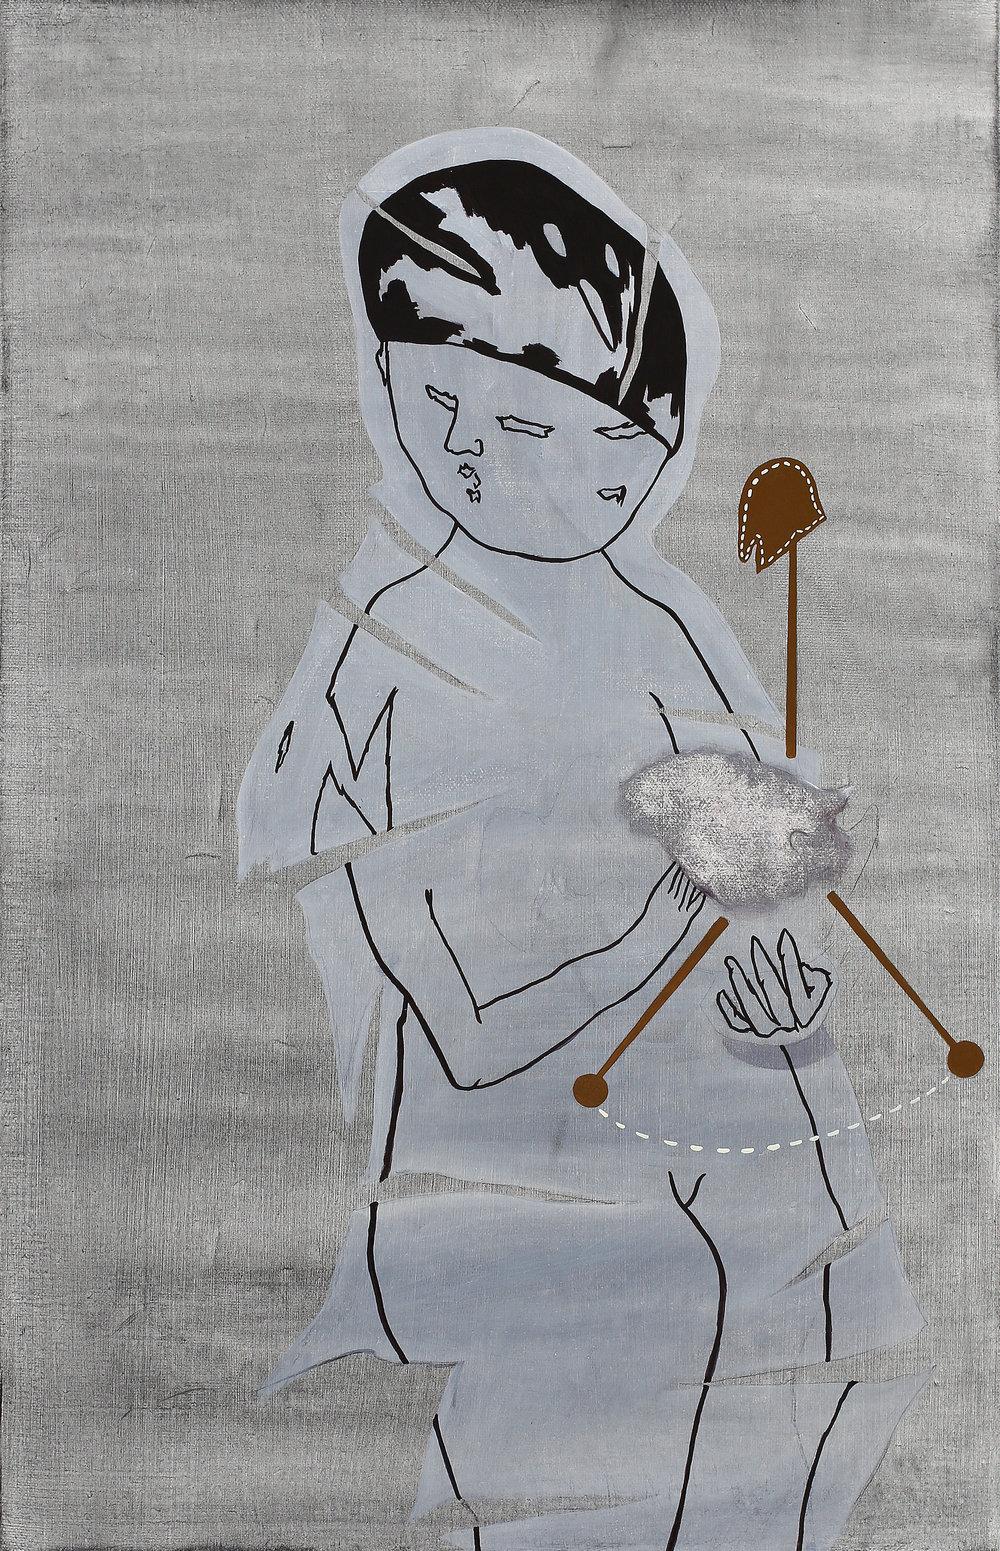 One boy and three  Roybies    2014, Oil on canvas, 53x33cm